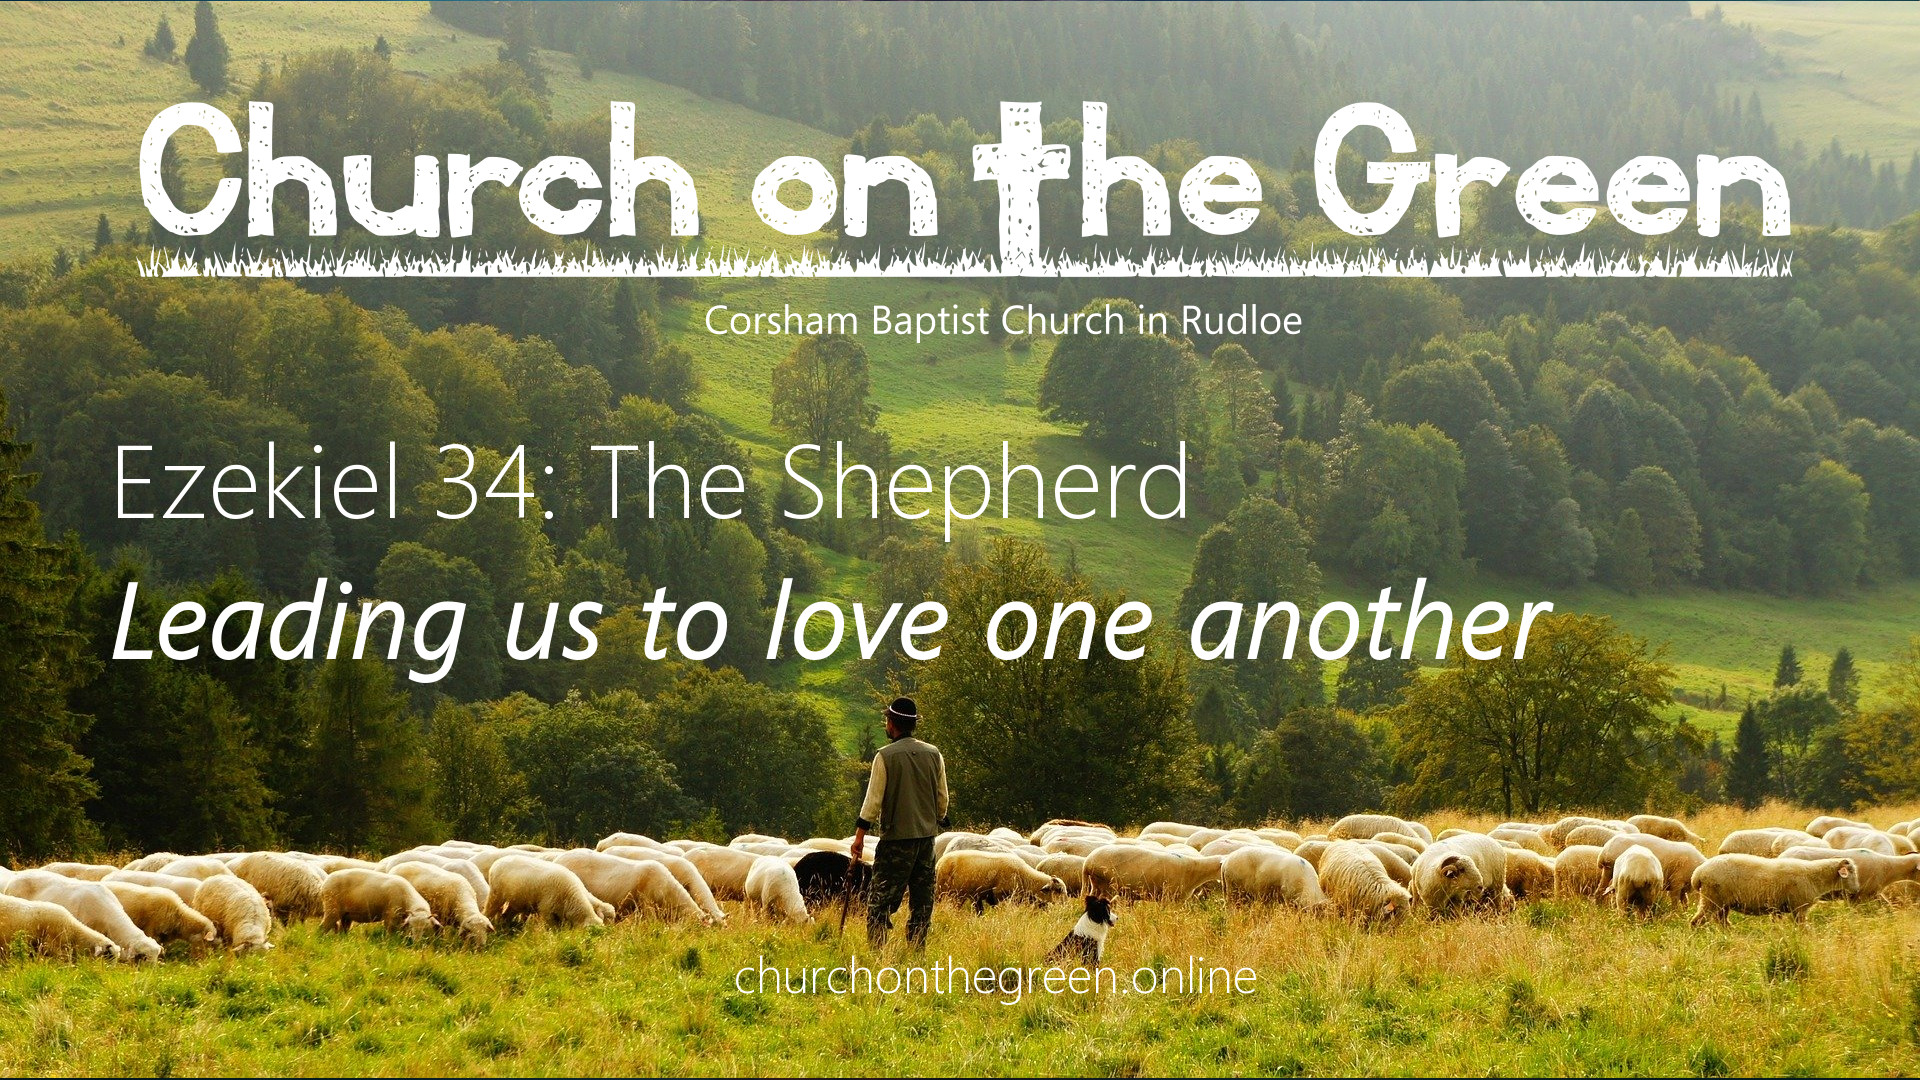 Ezekiel 34: The Shepherd – leading us to love one another